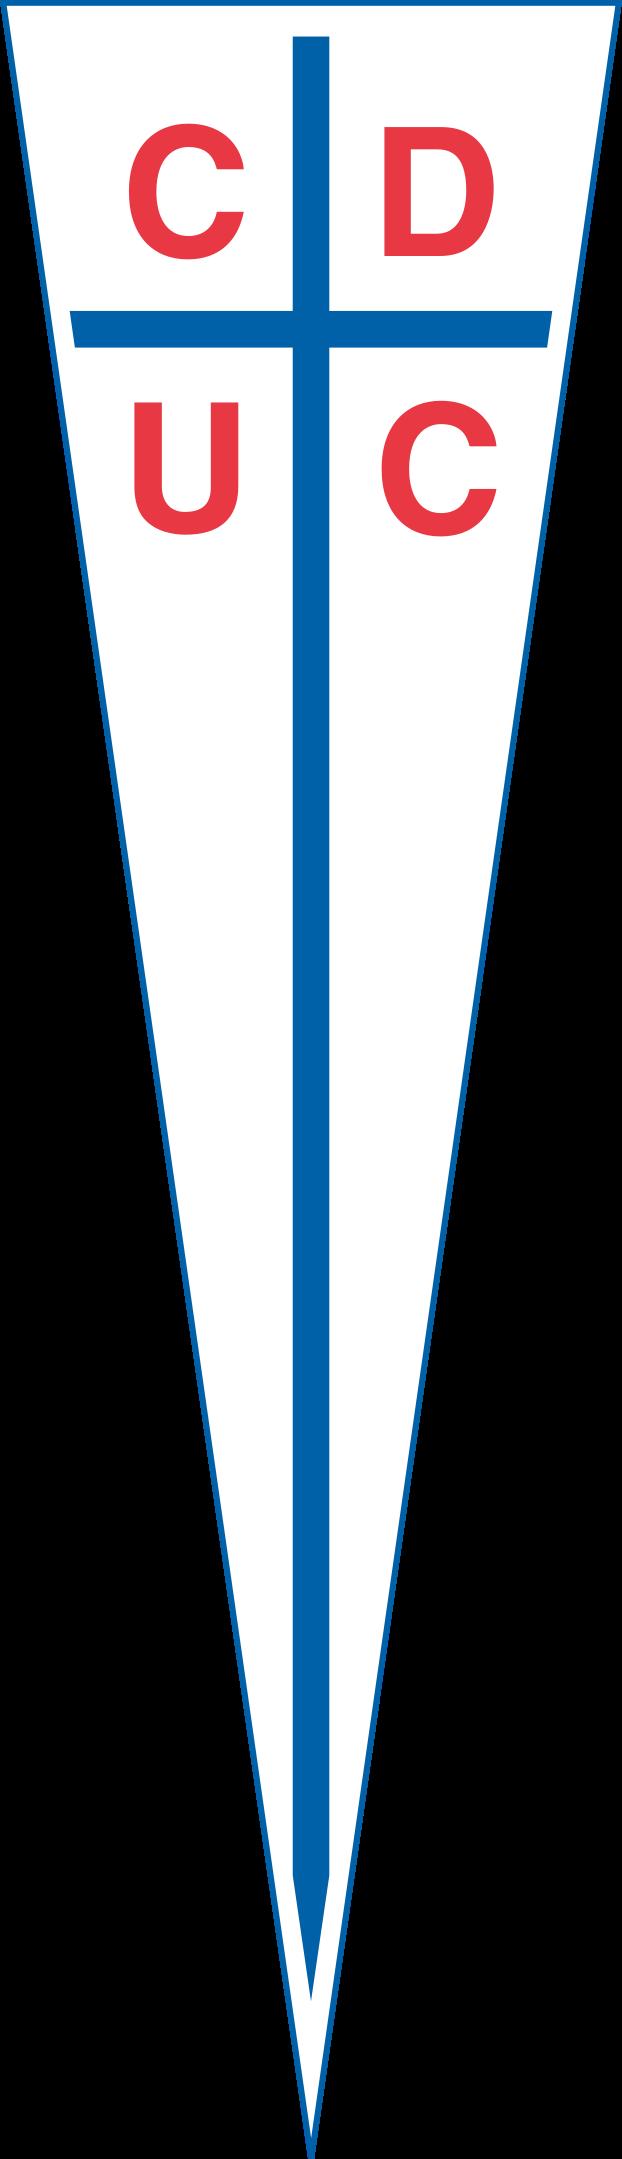 universidad catolica logo 1 - Universidad Católica Logo